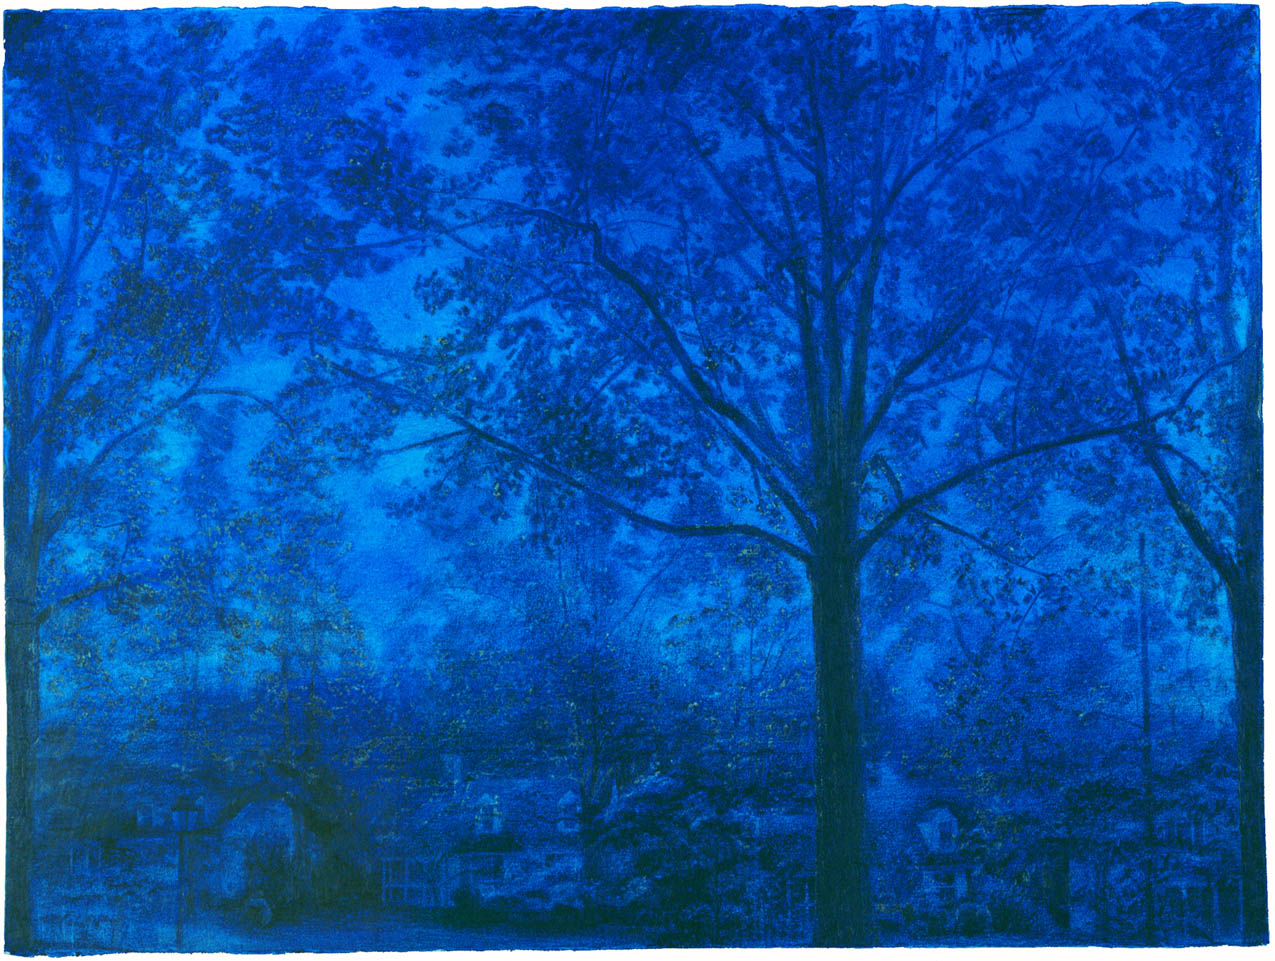 blue-twilightsm.jpg